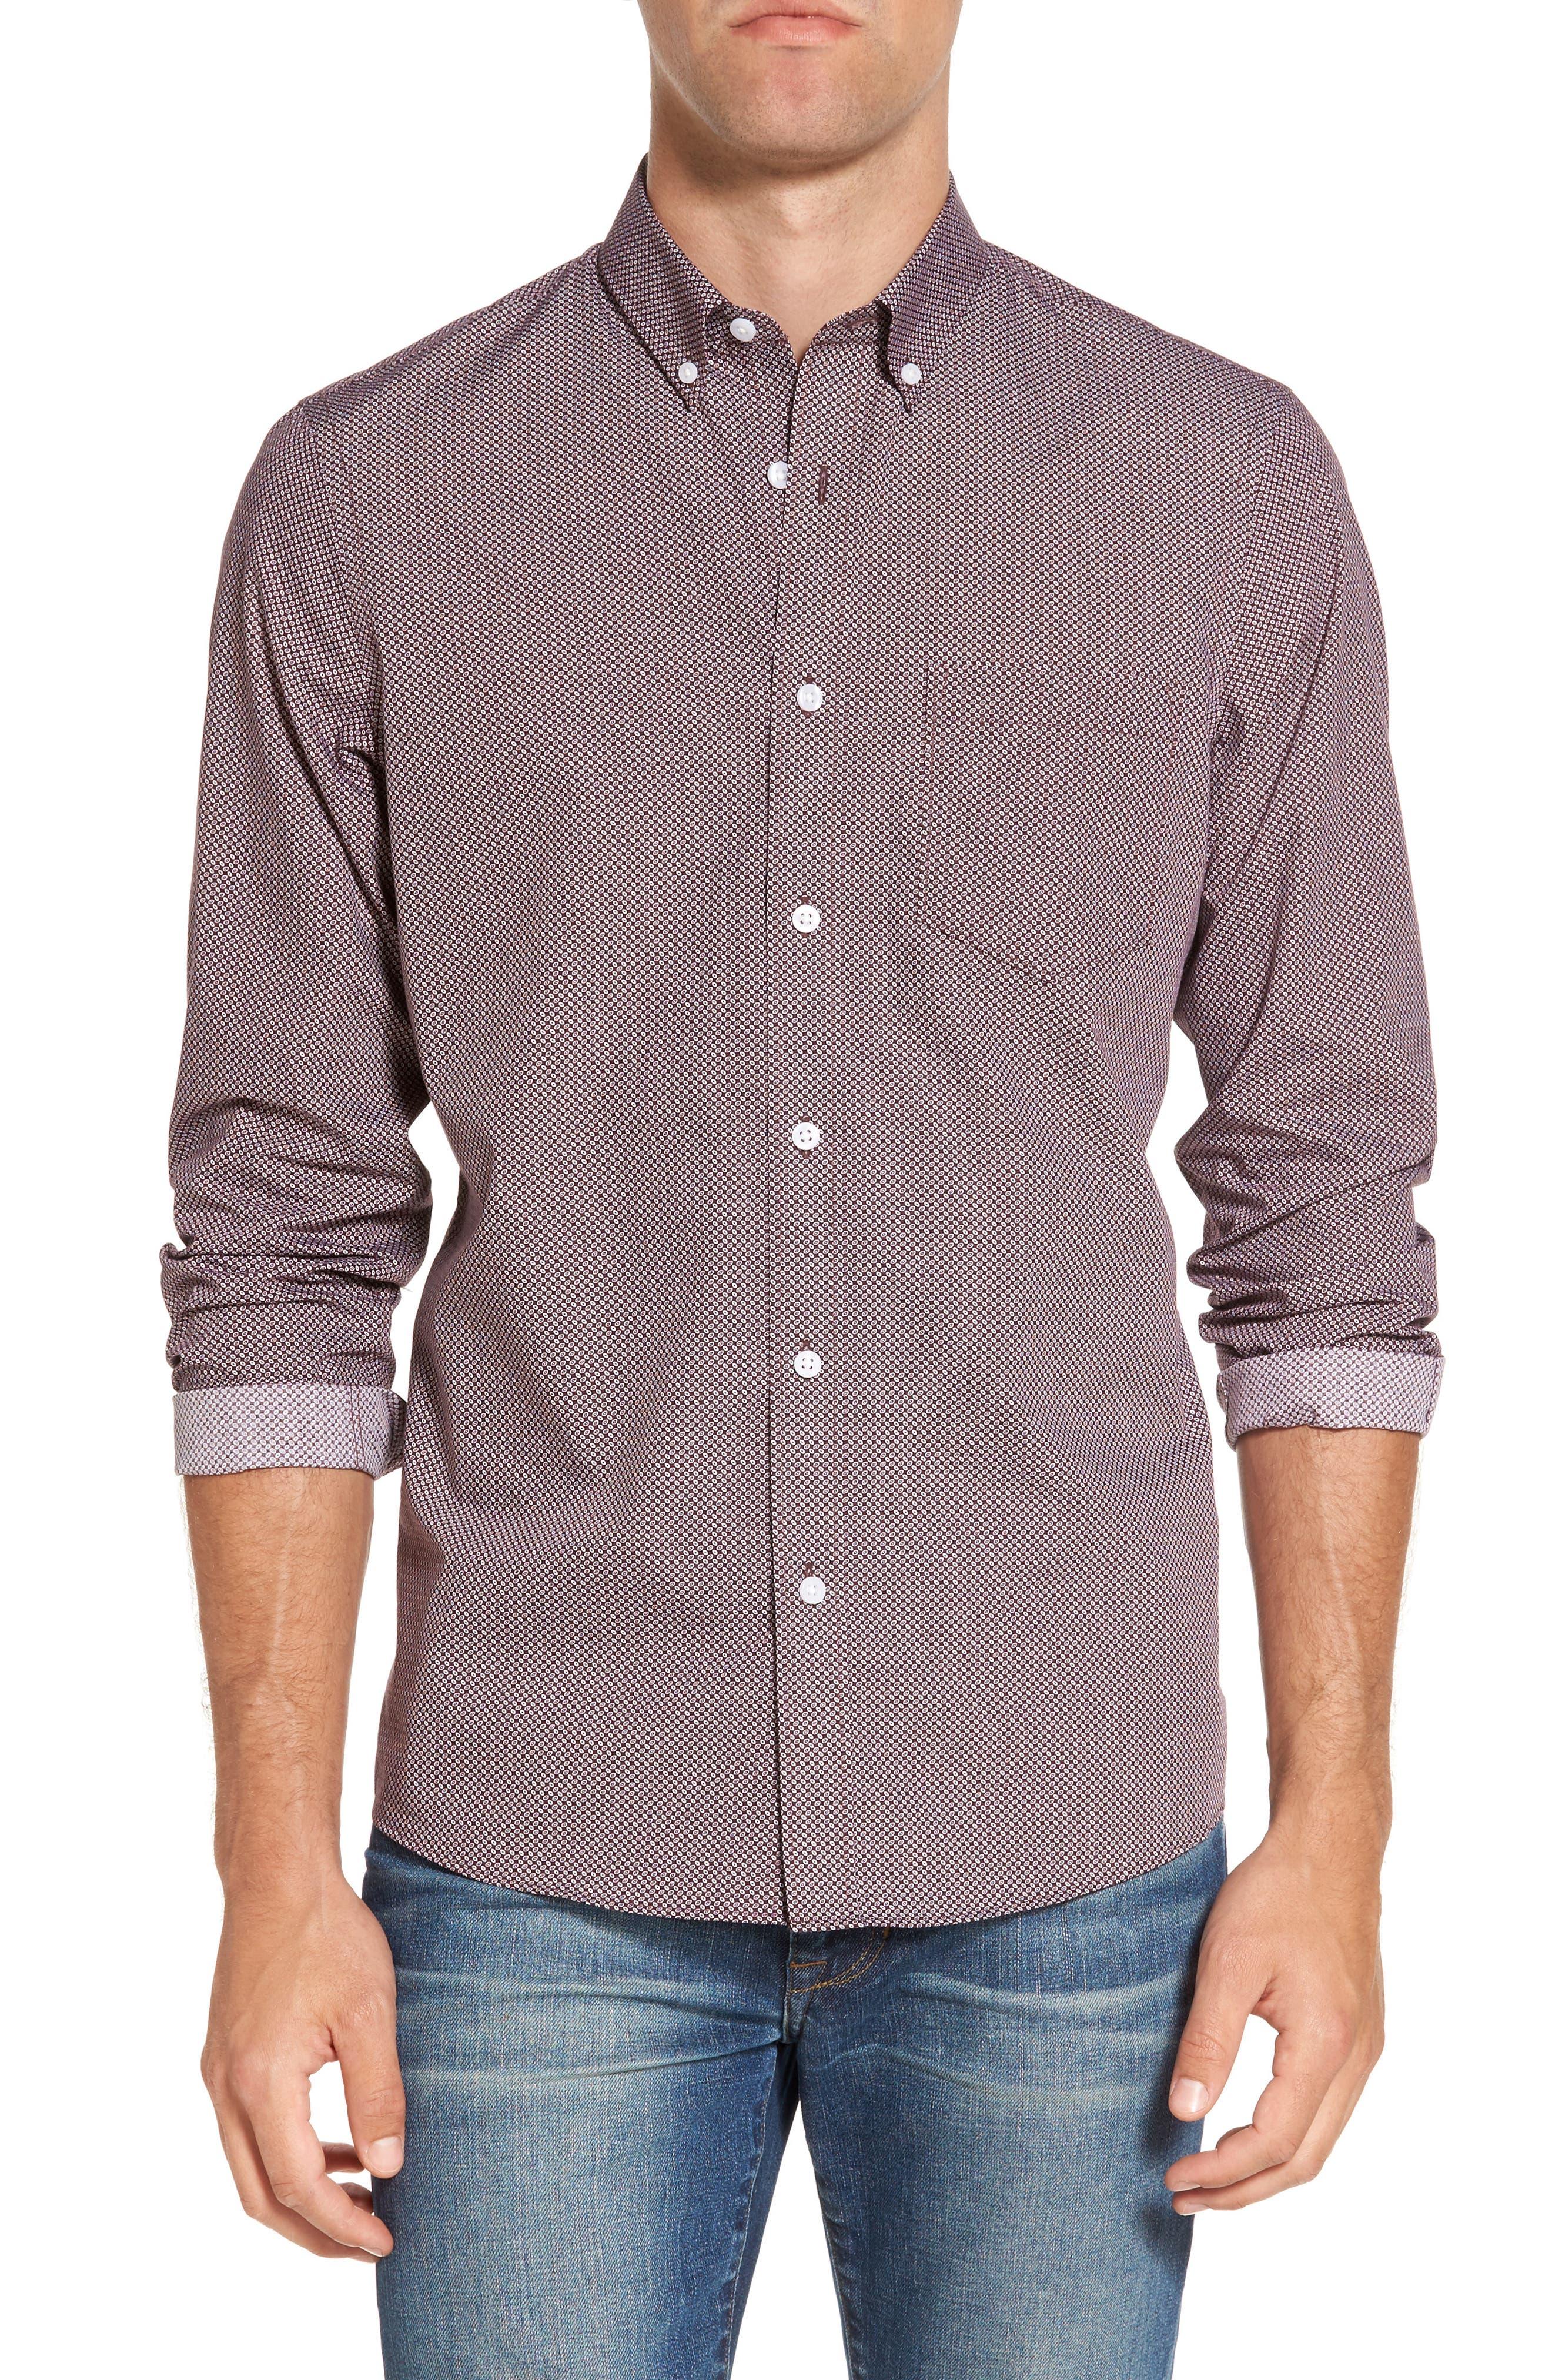 Alternate Image 1 Selected - Nordstrom Men's Shop Trim Fit Non-Iron Spade Print Sport Shirt (Regular & Tall)